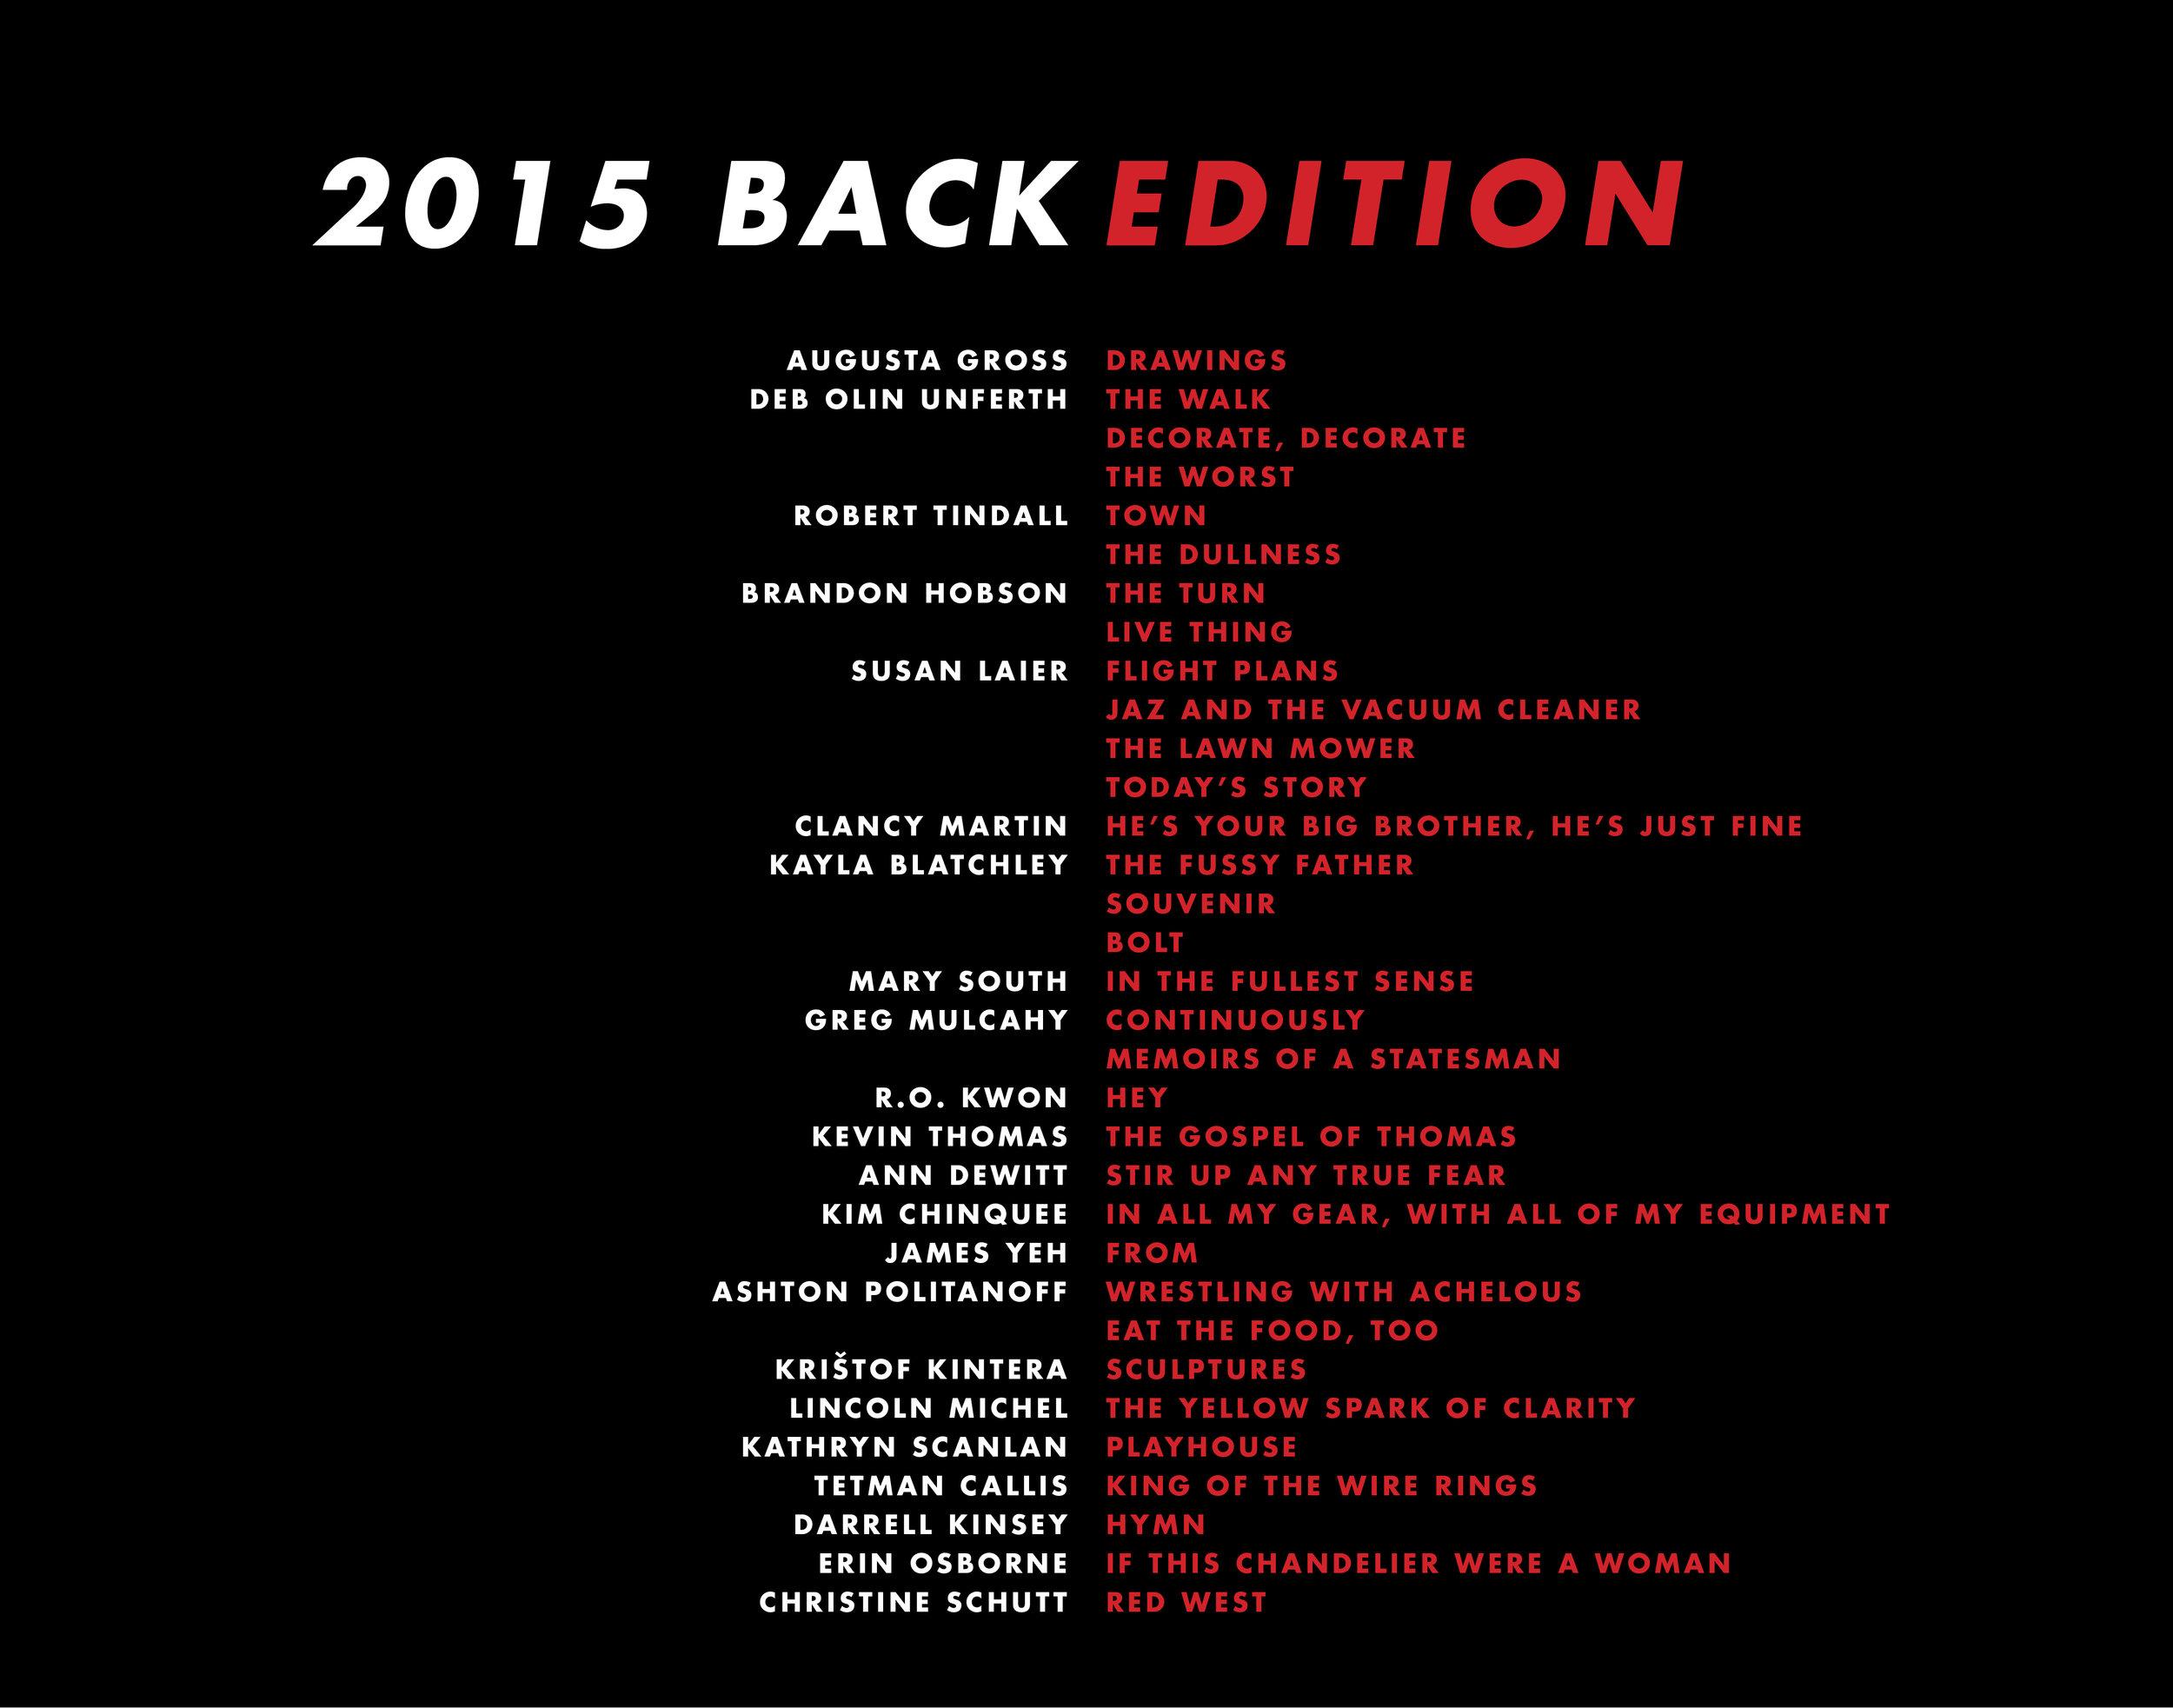 NOON.Back Edition.2015.jpg